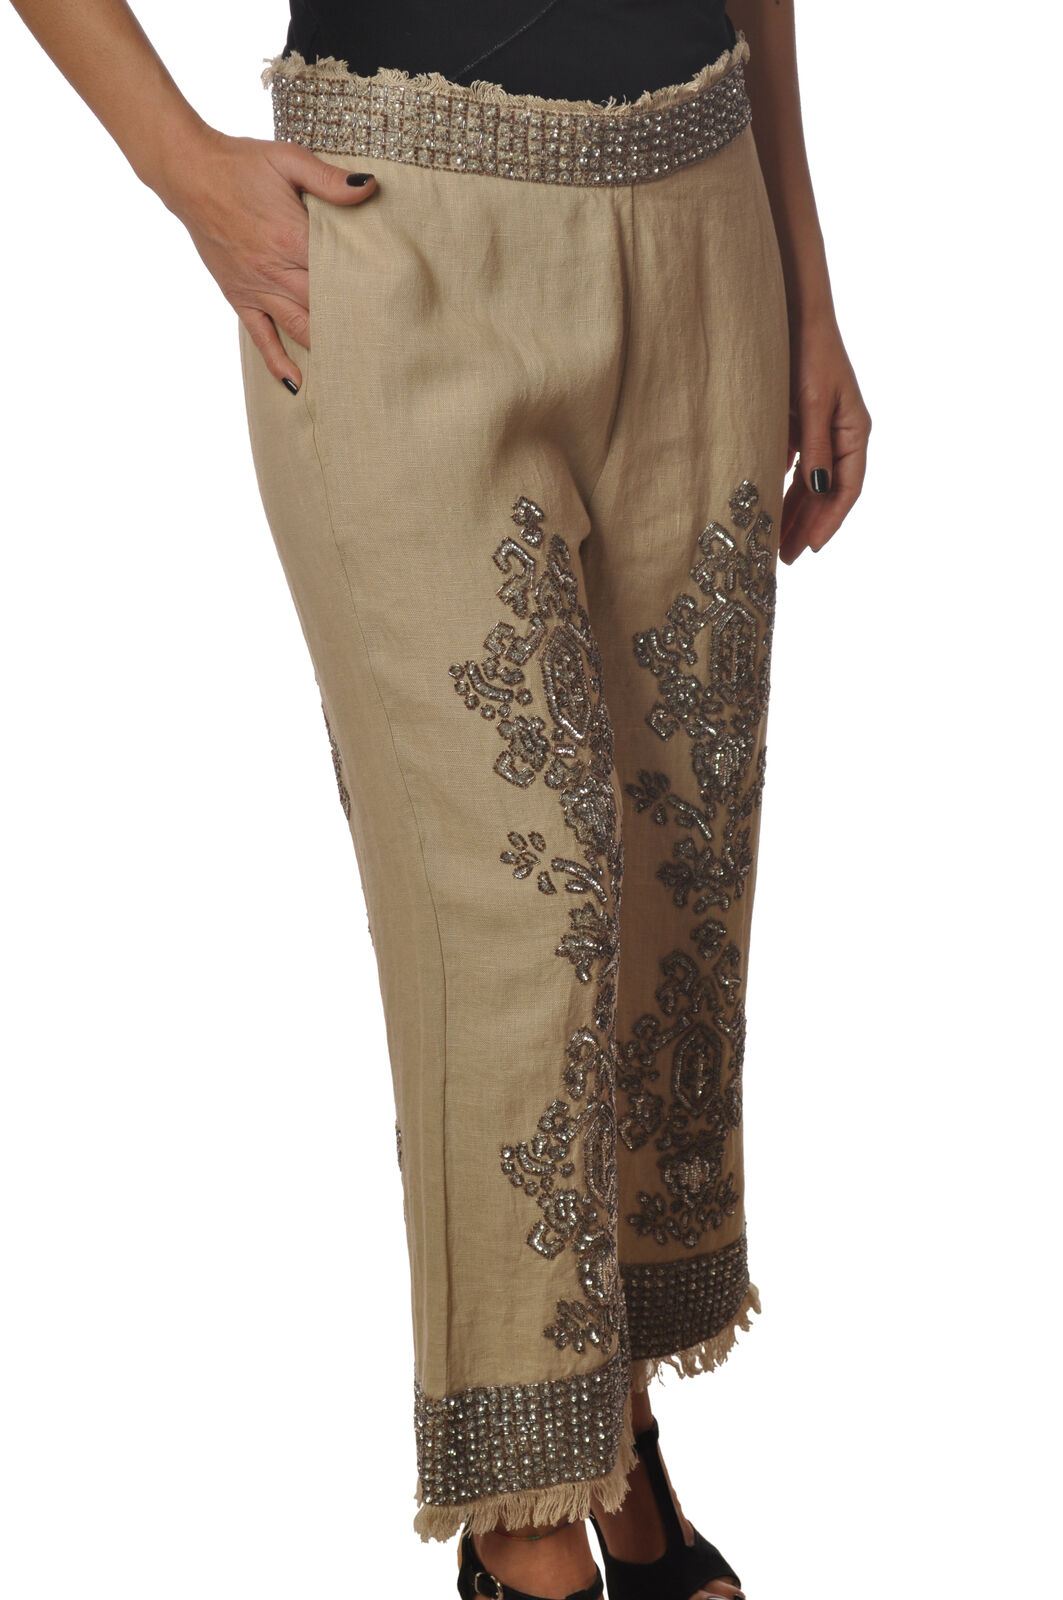 Twin Set - Pants-Pants - Woman - Beige - 6249601E191625